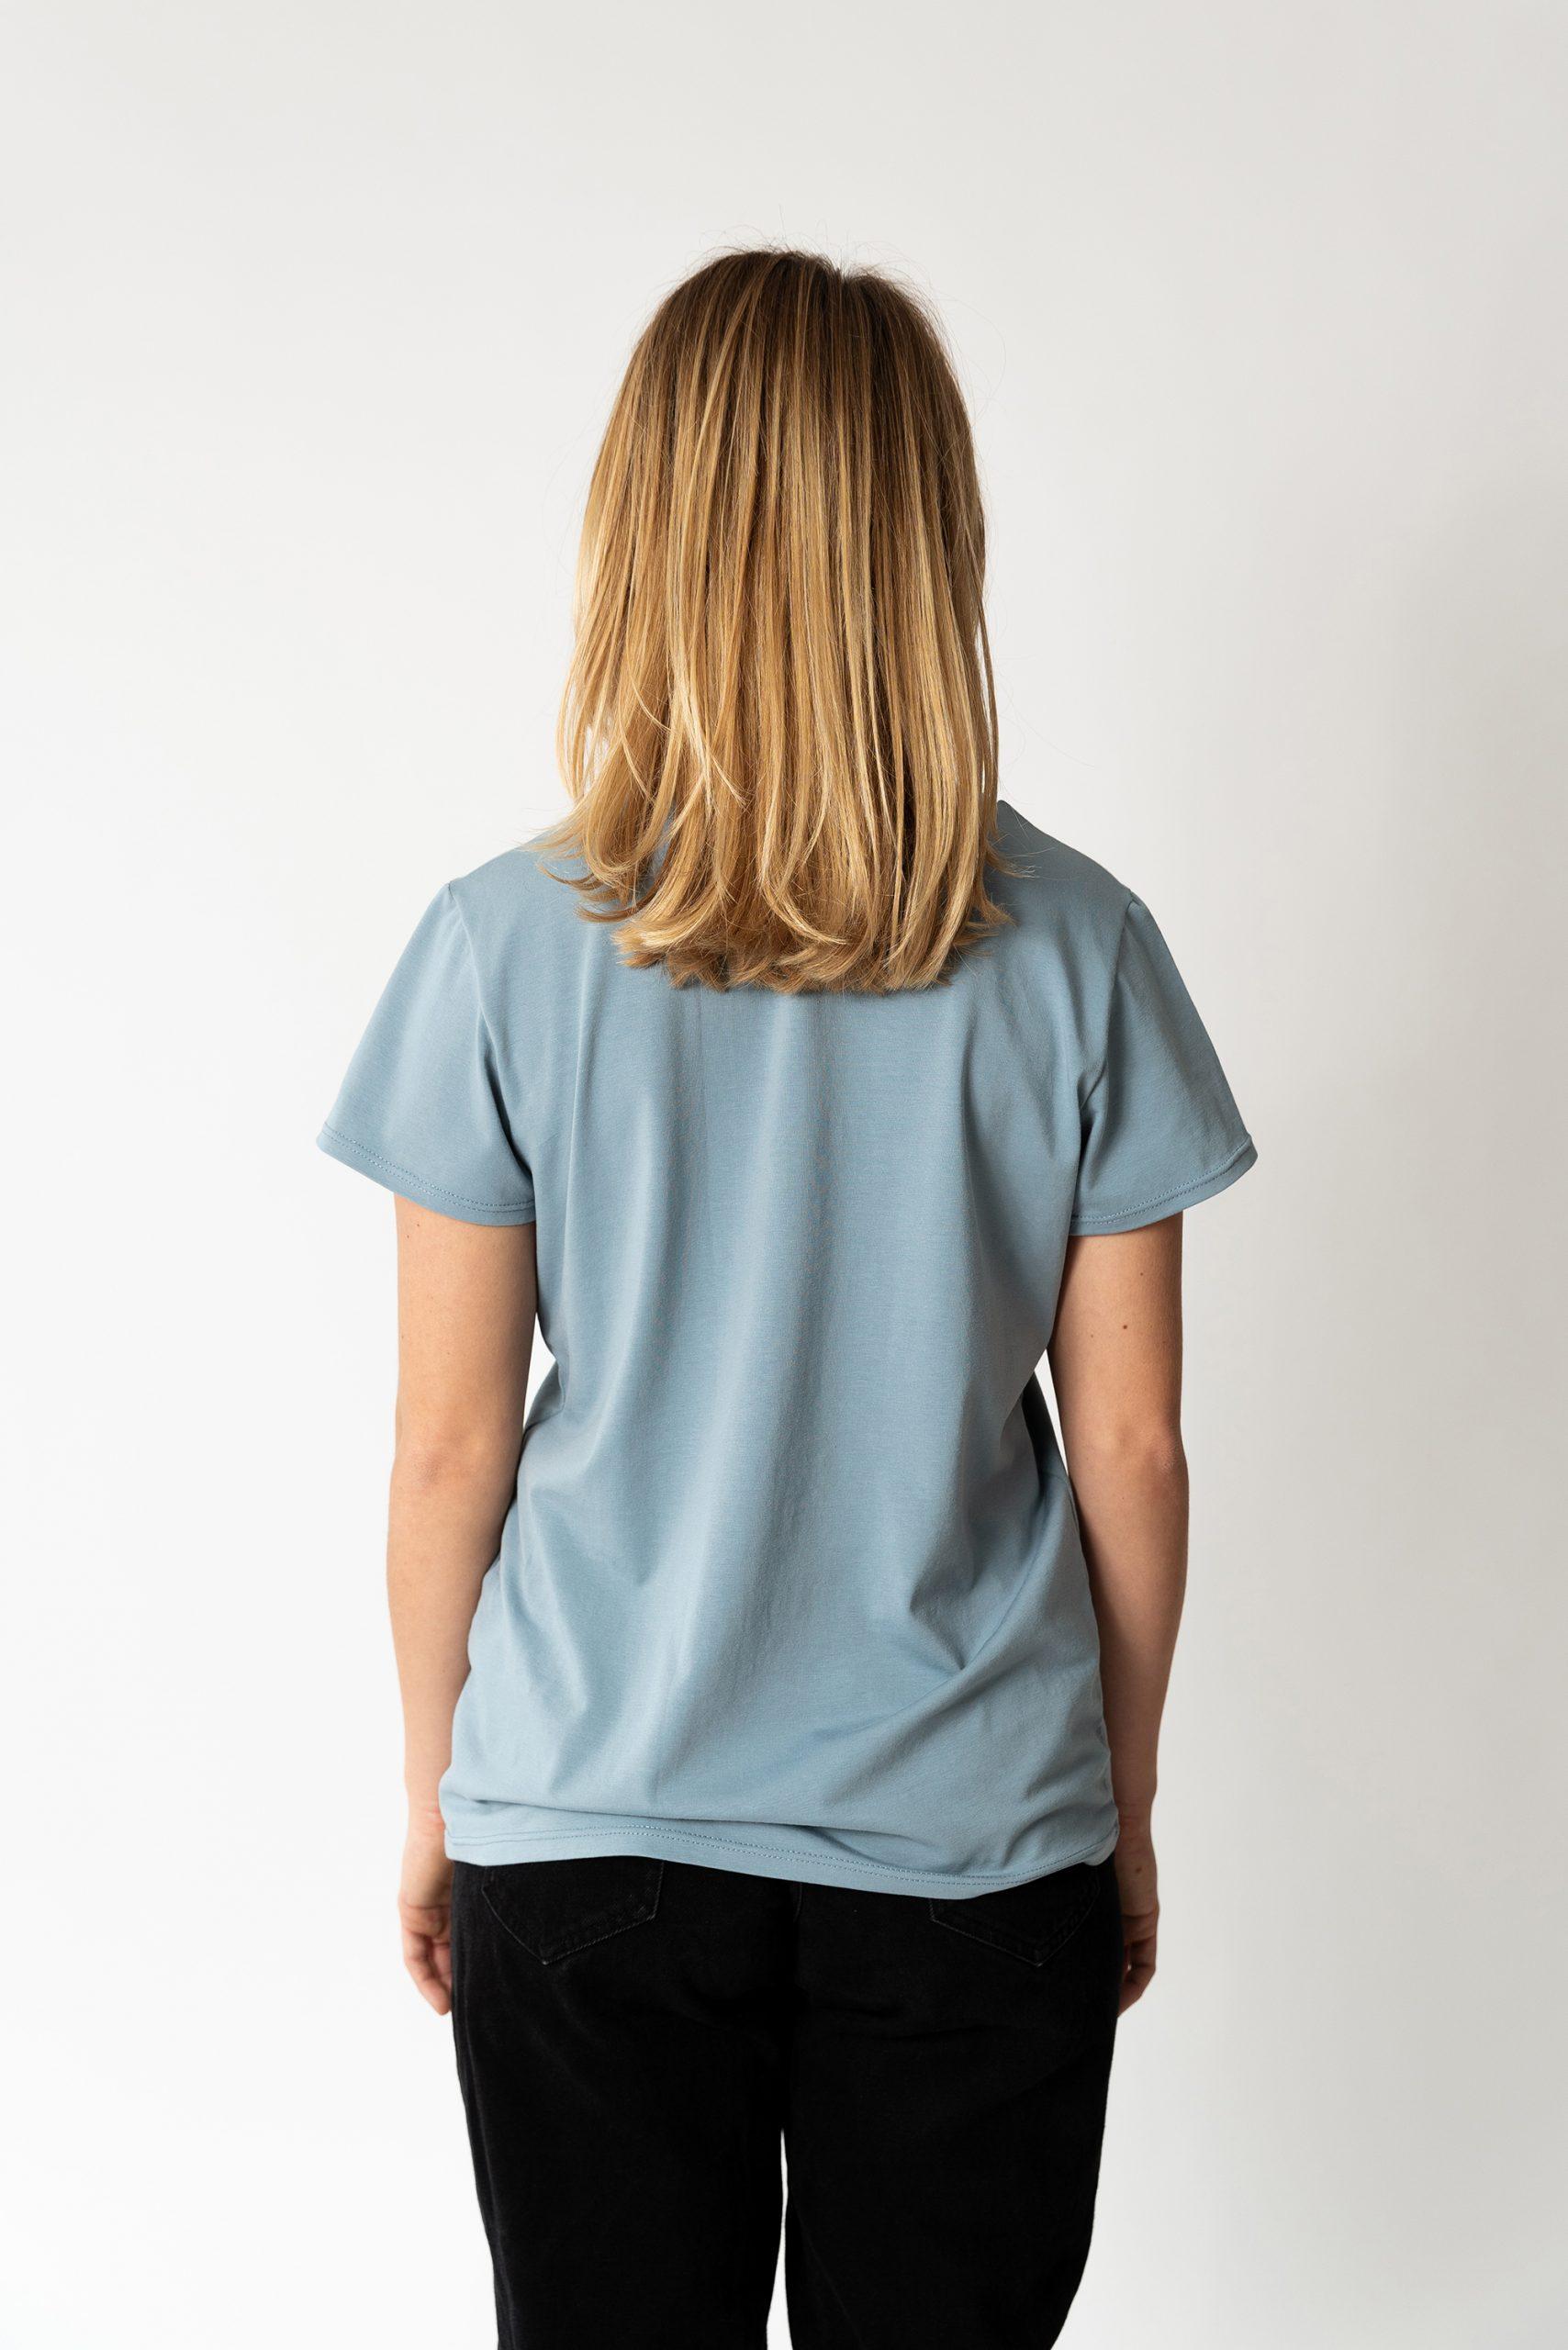 Schnittmuster T-Shirt #swag Tragefoto Model Rückenansicht